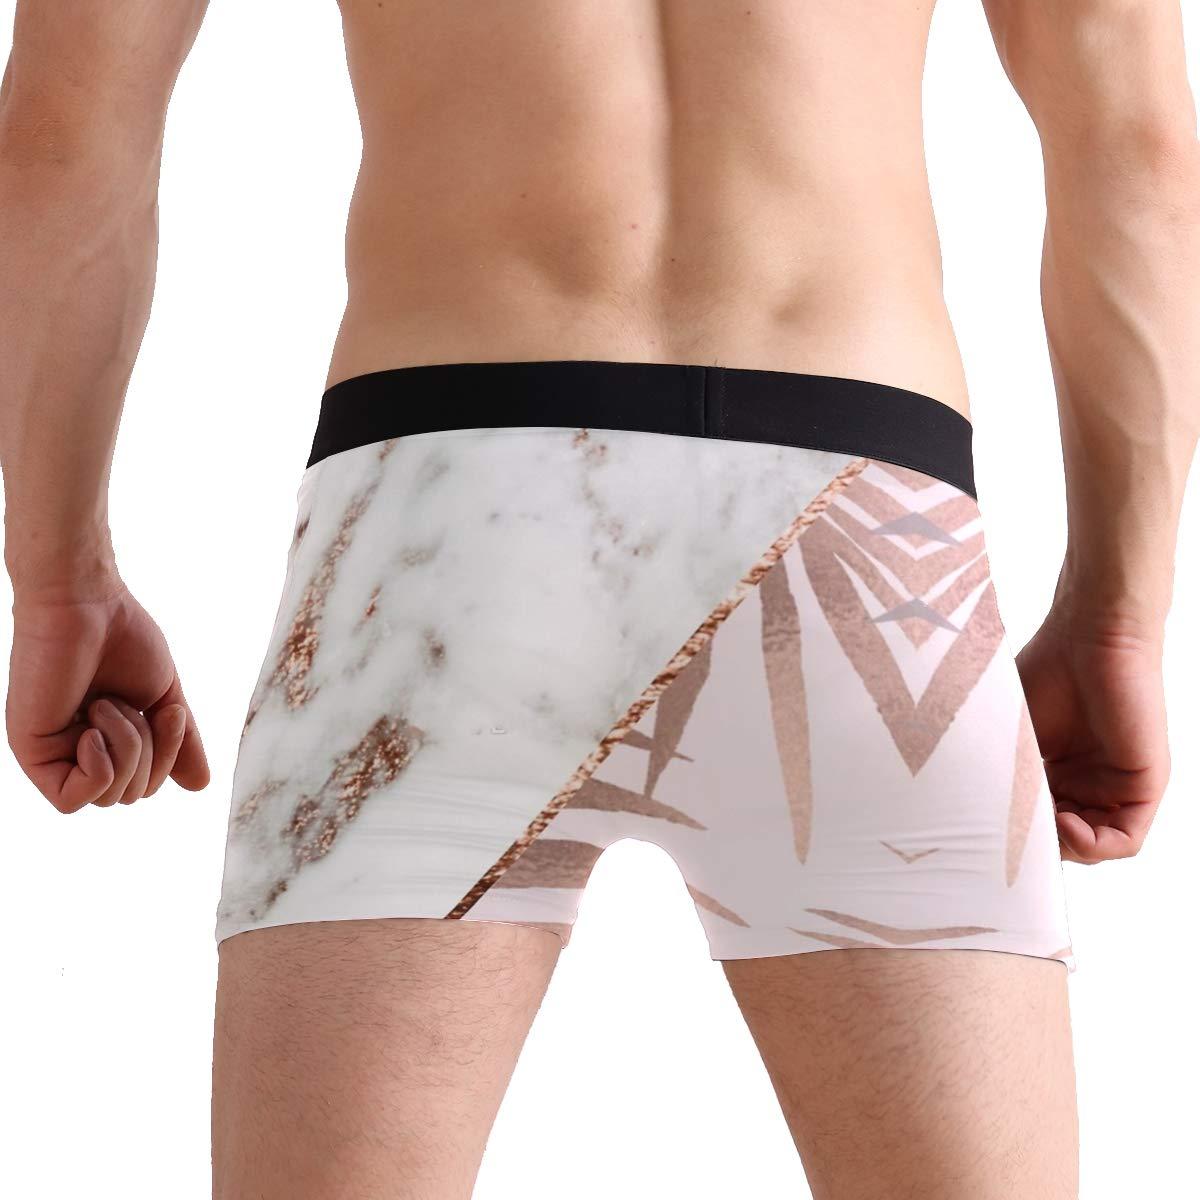 Rose Gold Marble Tropical Mens Underwear Mens Bag Soft Cotton Underwear 2 Pack